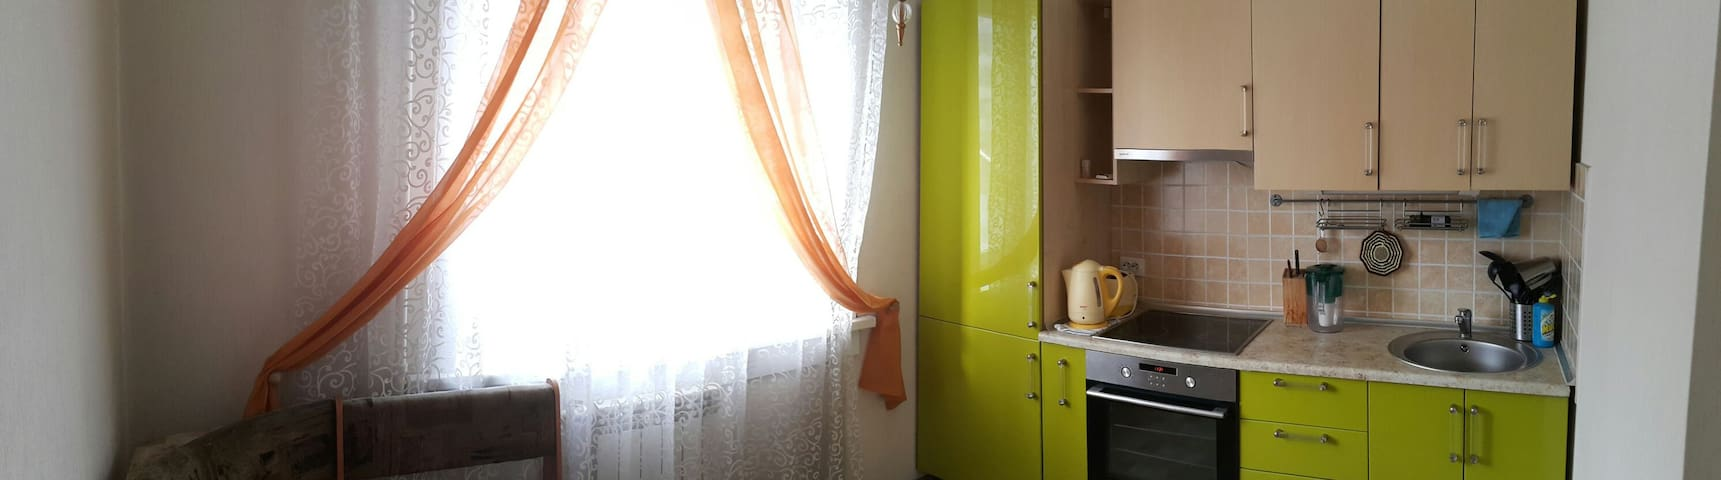 Уютная однокомнатная в центре Бердска - Berdsk - Apartemen